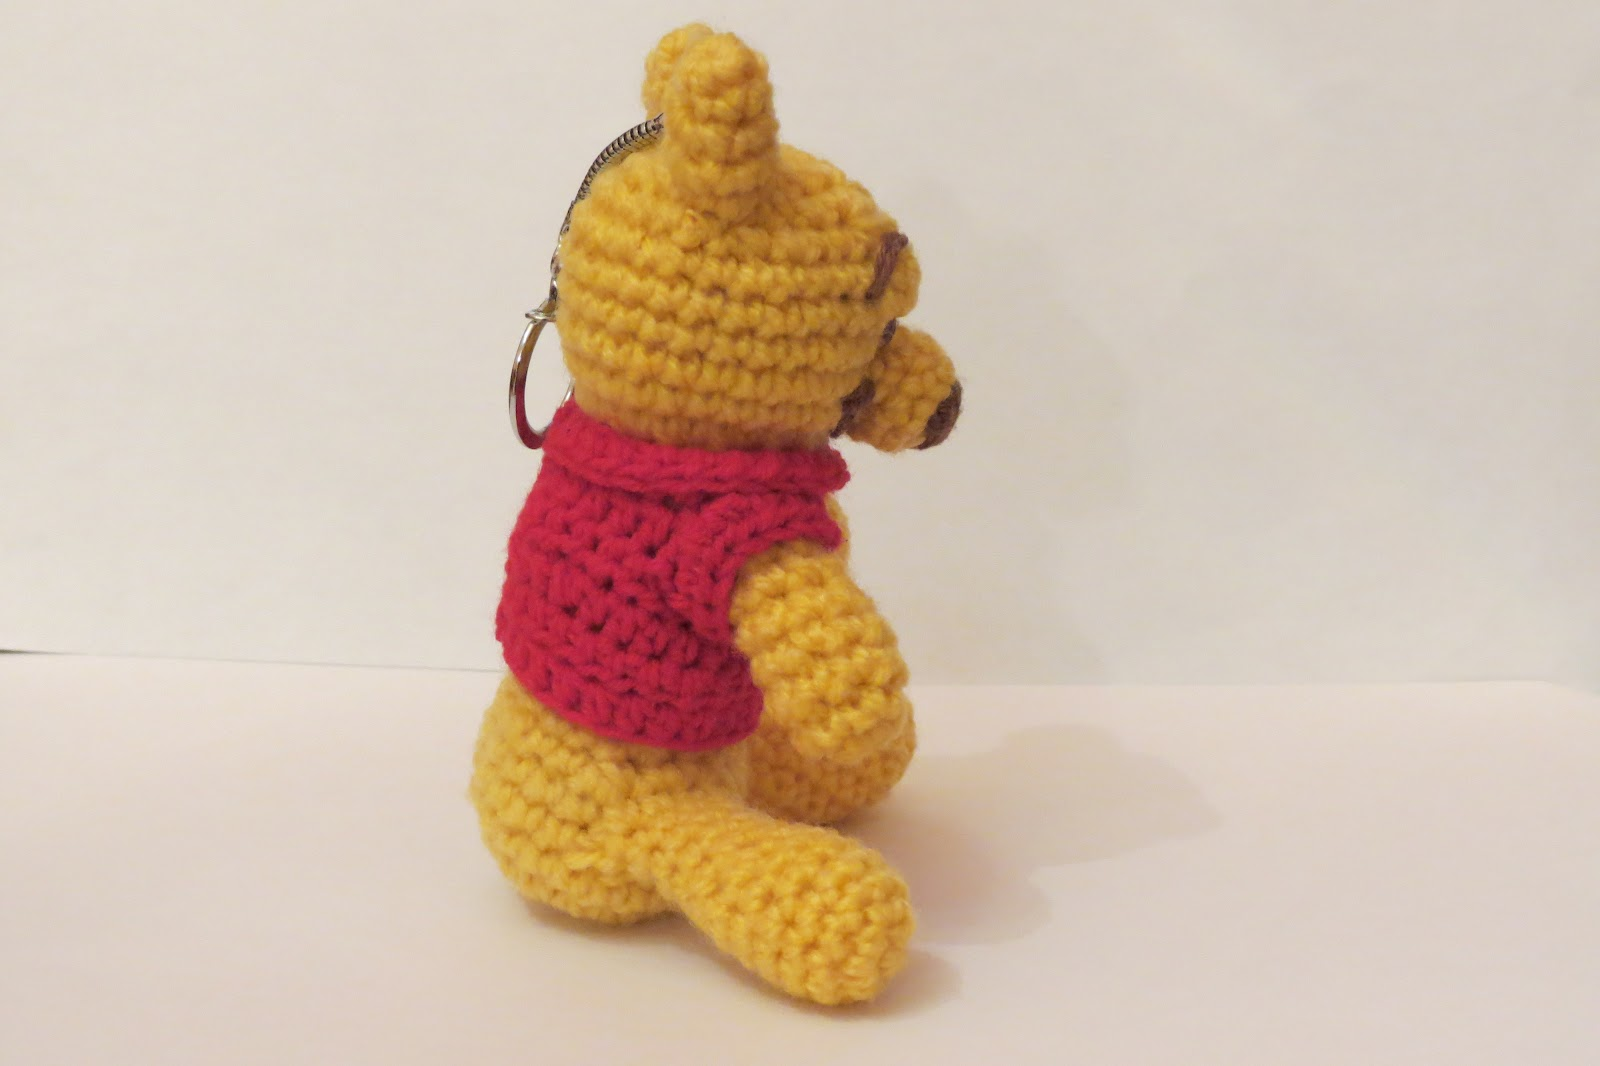 Amigurumi Winnie The Pooh : Crochet Amigurumi Winnie The Pooh Small manal311